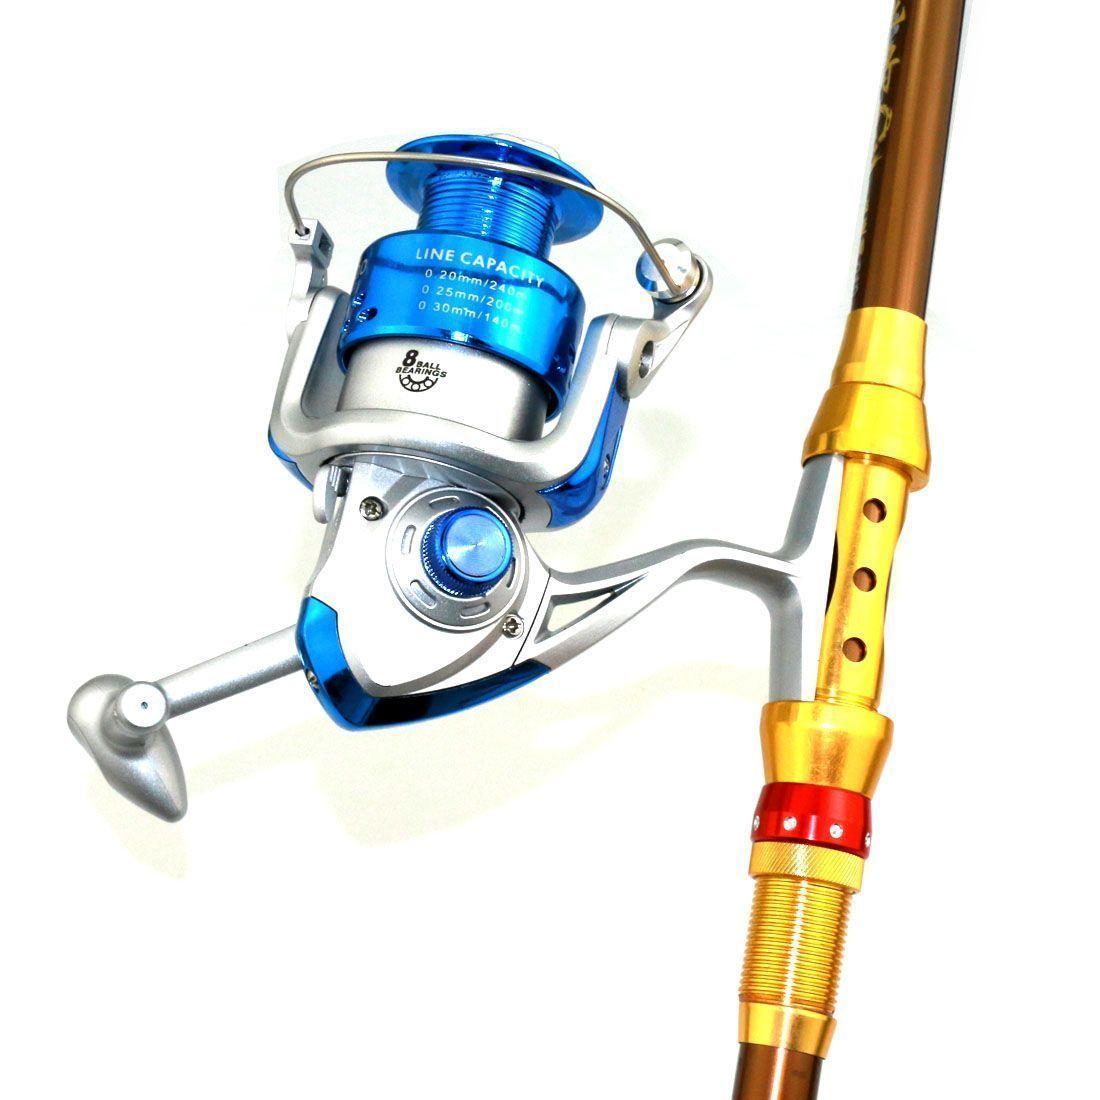 #3BB #Boat #CS10007000 #Fishing #fitness #fitnessstudio #gleitscheiben fitness #3BB #Boat #CS1000700...